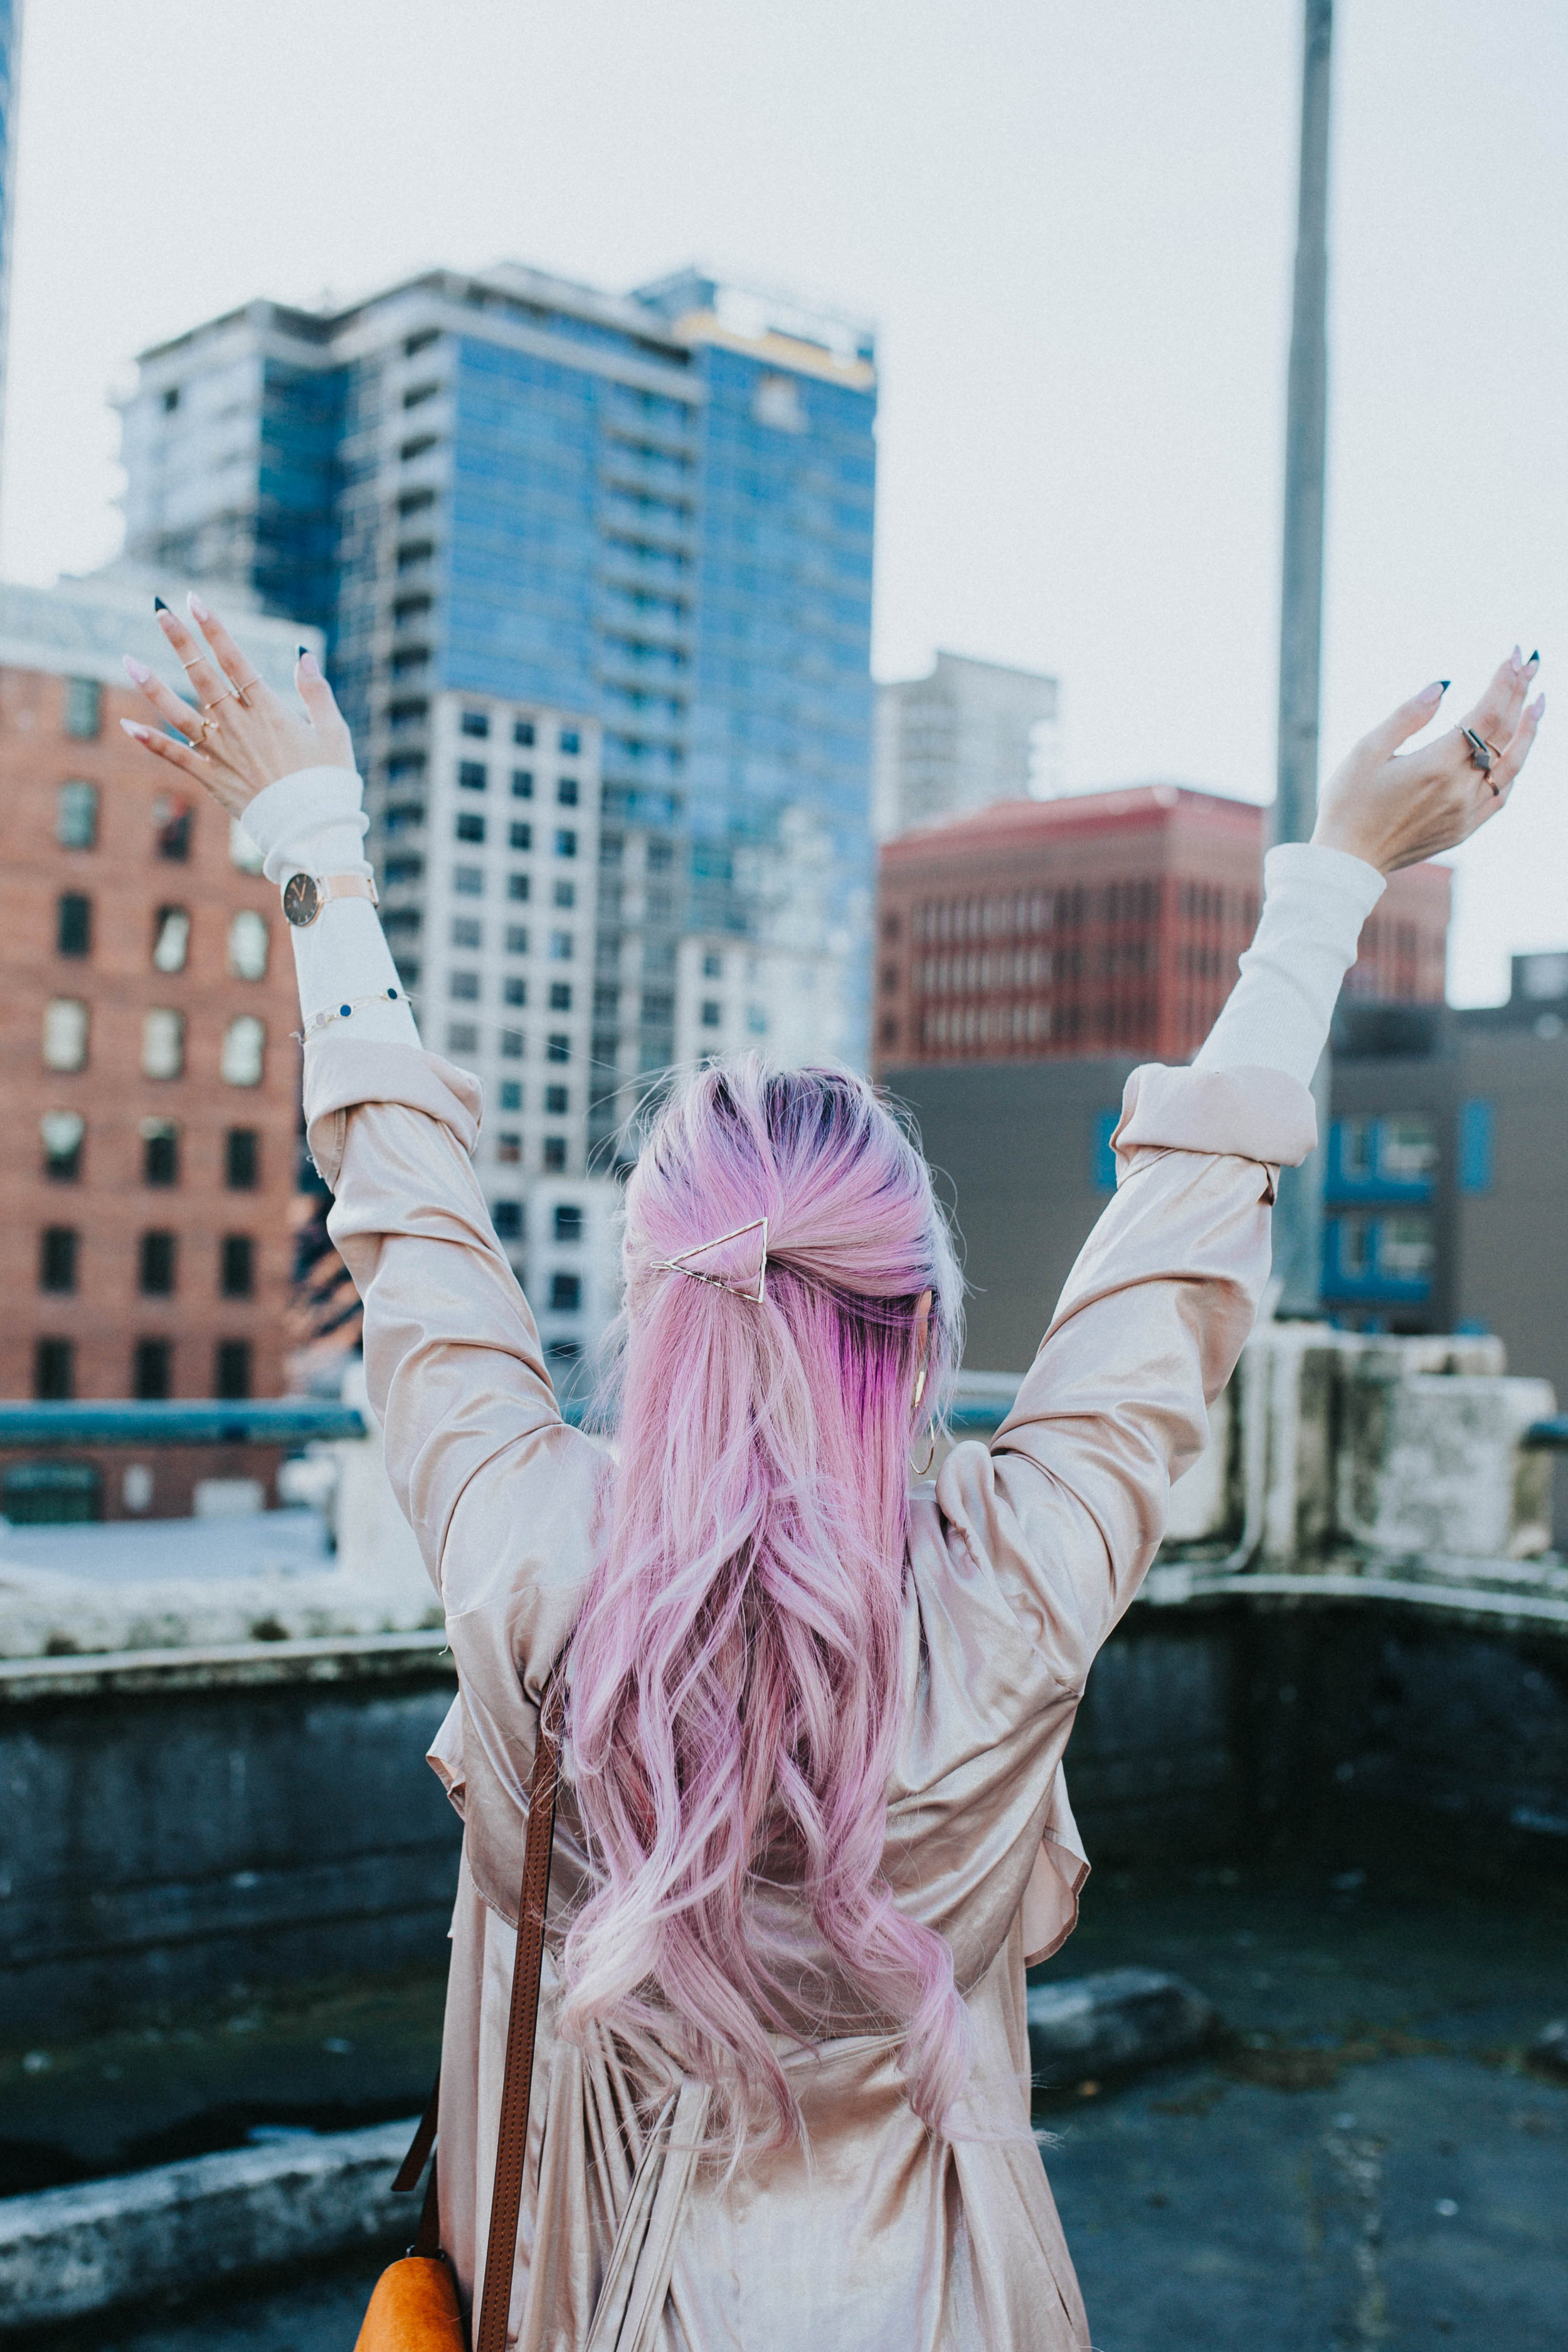 Mango Pink Metallic Trench Coat_ZARA White mock neck top_ZARA lace bralette_J Brand skinny jeans_Chloe Mini Faye Leather Shoulder Bag_Ego Ankle Boots_Free People Aviator Sunglasses_Argento Vivo Earrings_Aikas Love Closet_Seattle Style Fashion Blogger_Japanese_Pink hair 20